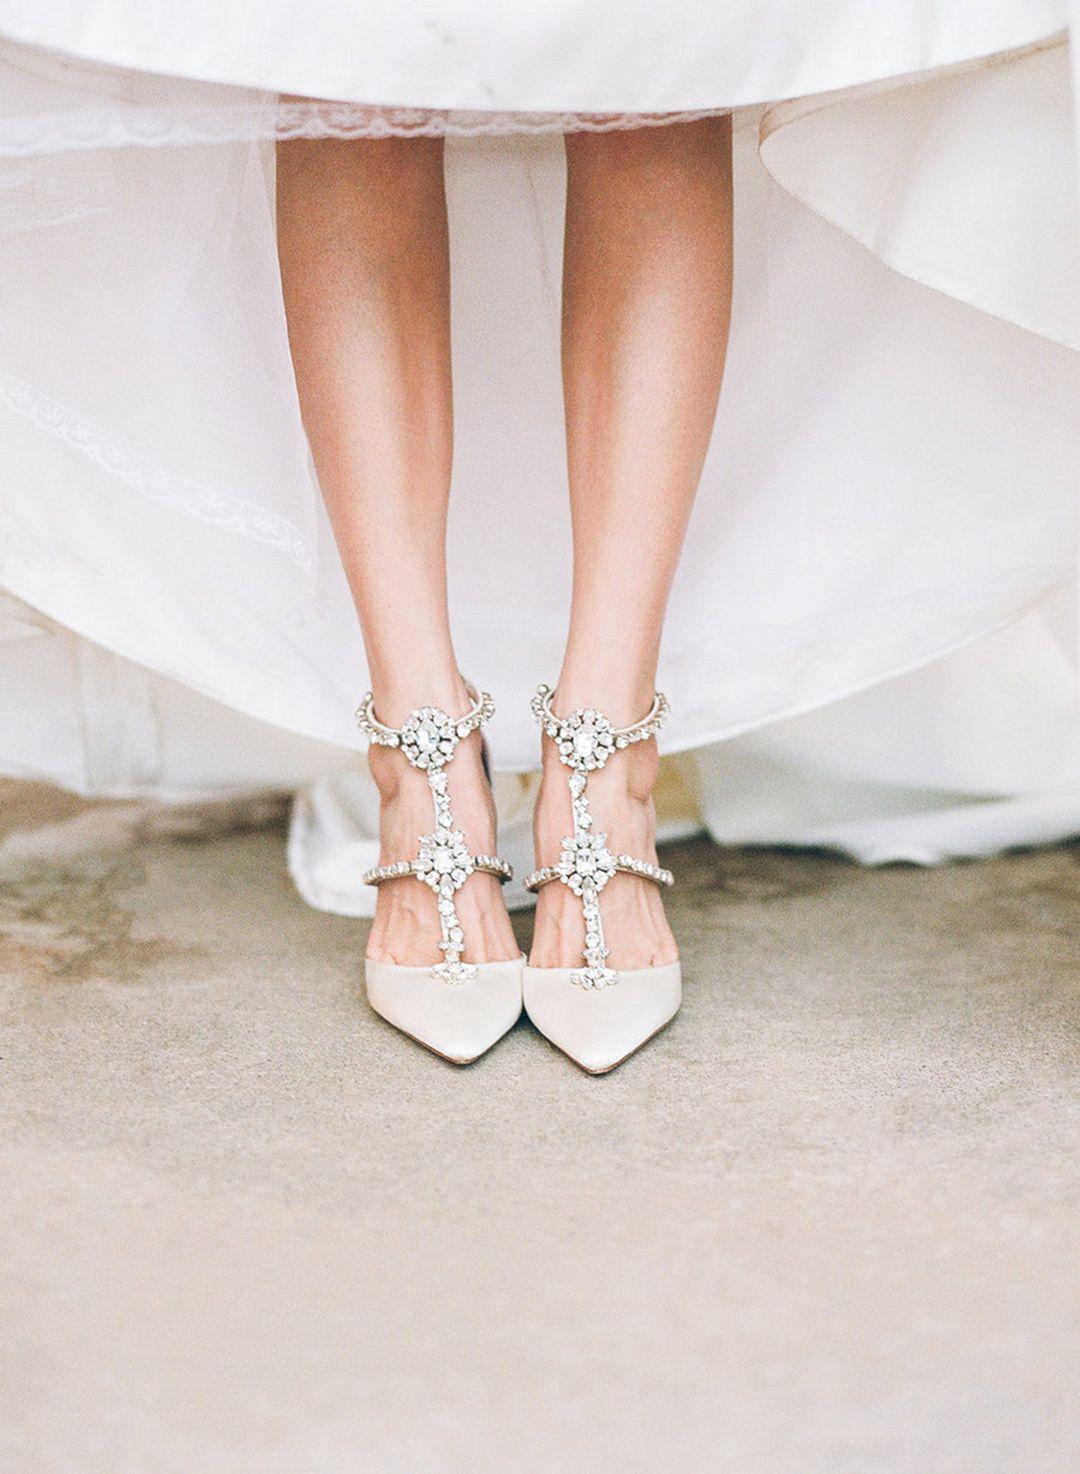 45 Beautiful Winter Wedding Shoes For Bride Looks More Elegant